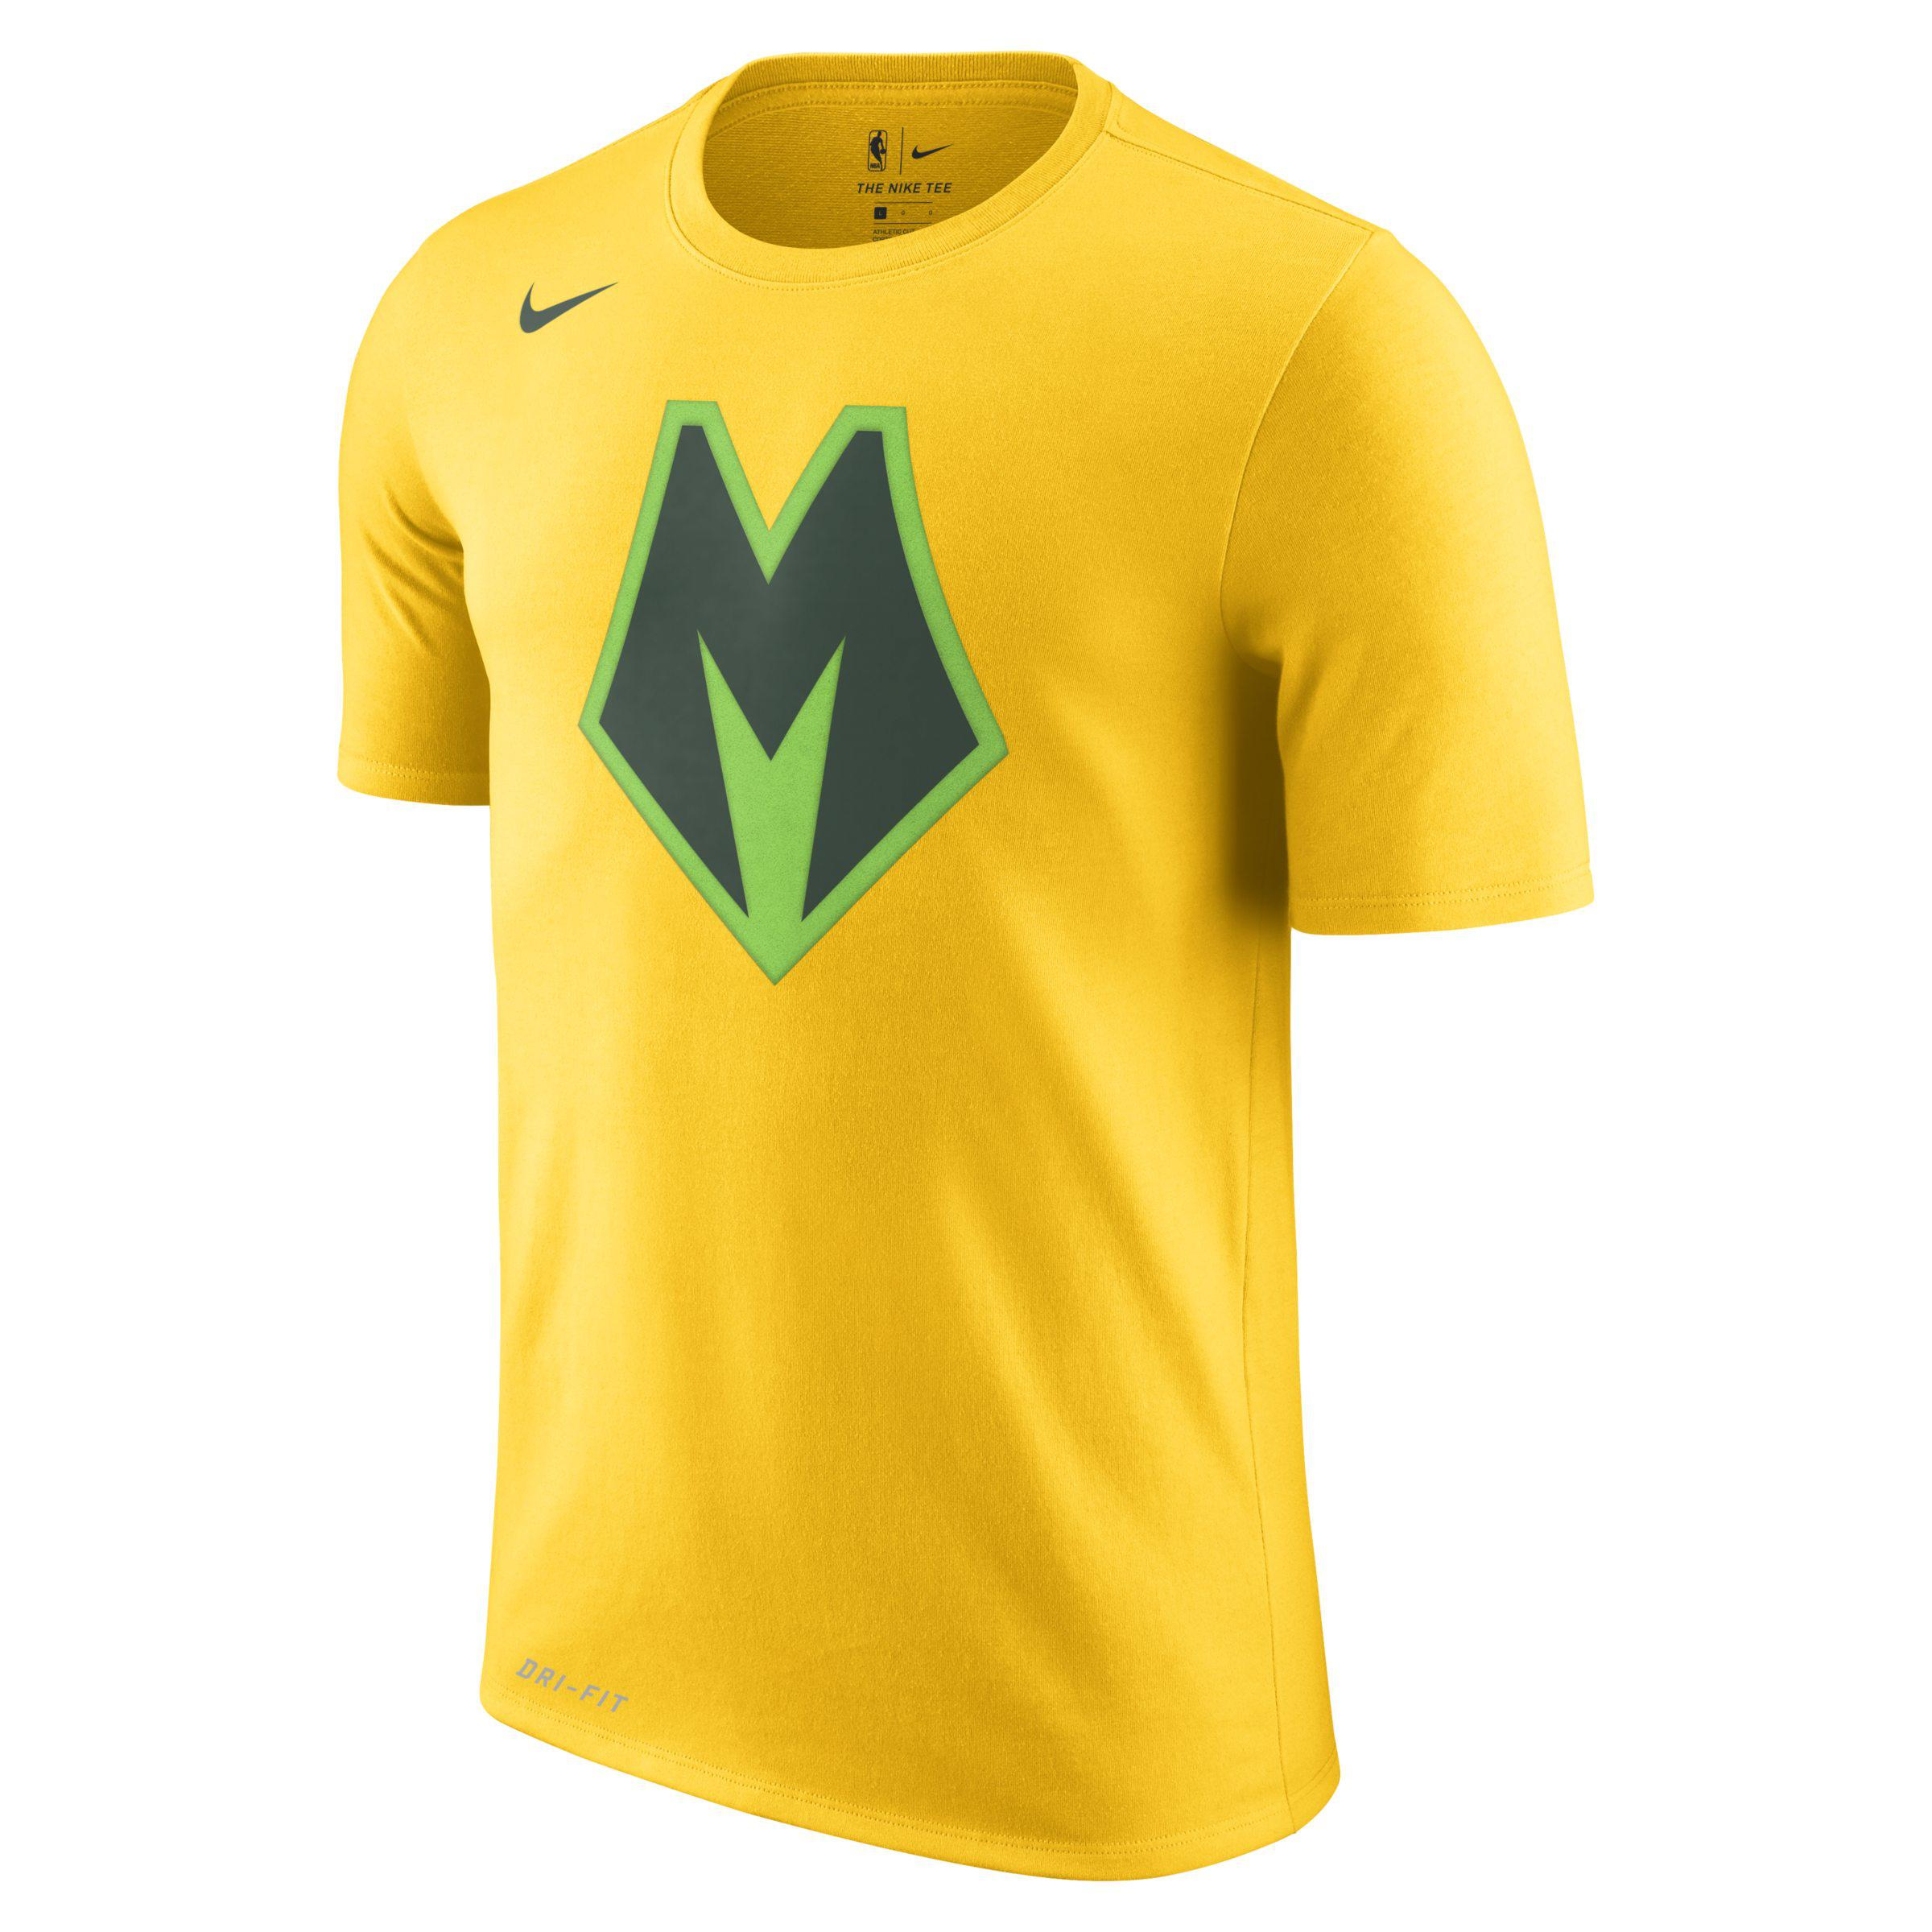 Nike Milwaukee Bucks City Edition Dri-fit Nba T-shirt in Yellow for ... 454047969